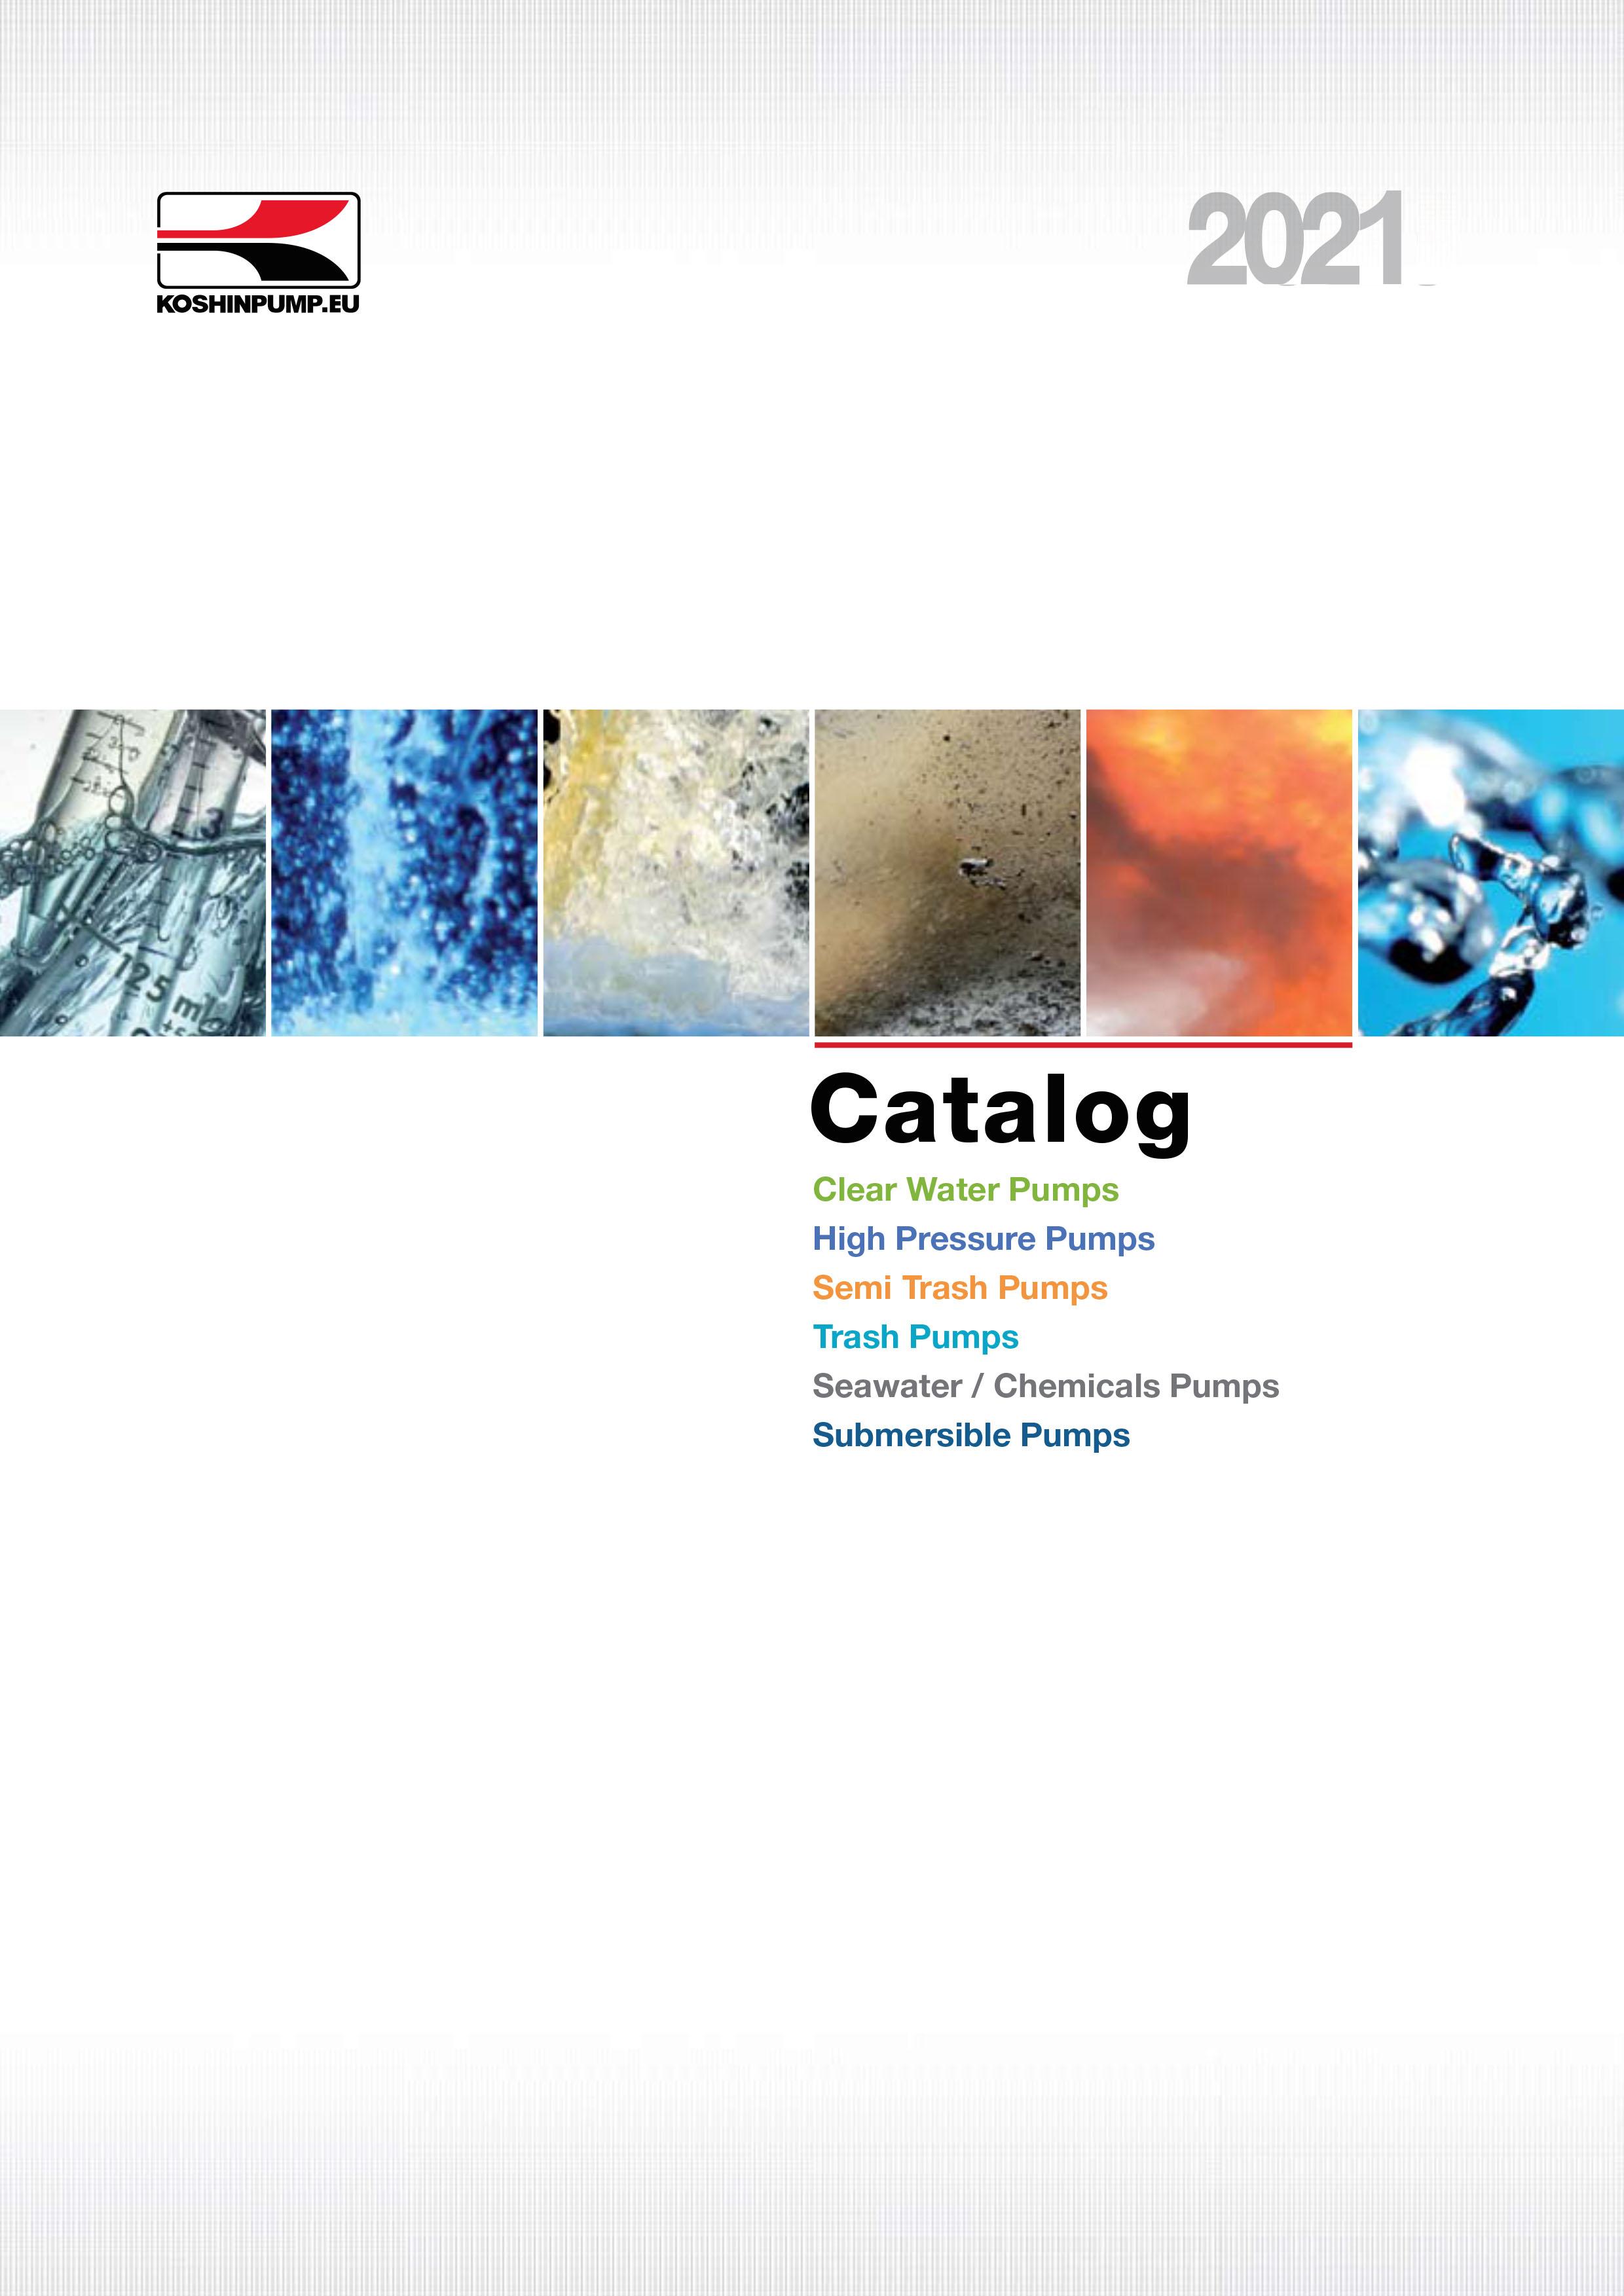 EES Koshin Katalog 2021 English-s-1